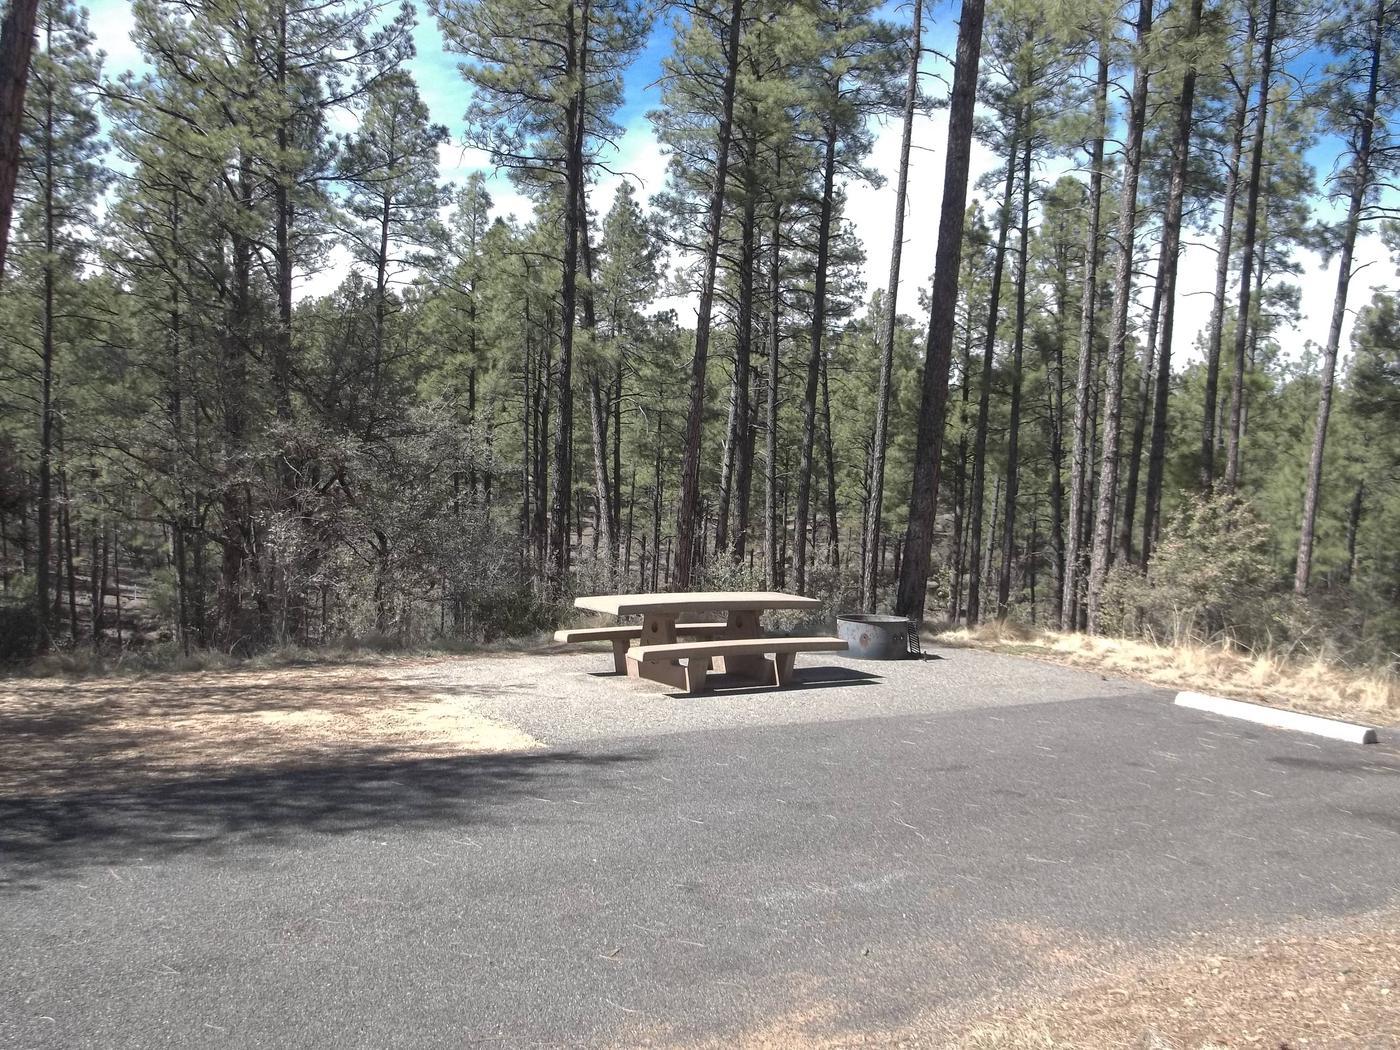 Hilltop Campground Campsite 9